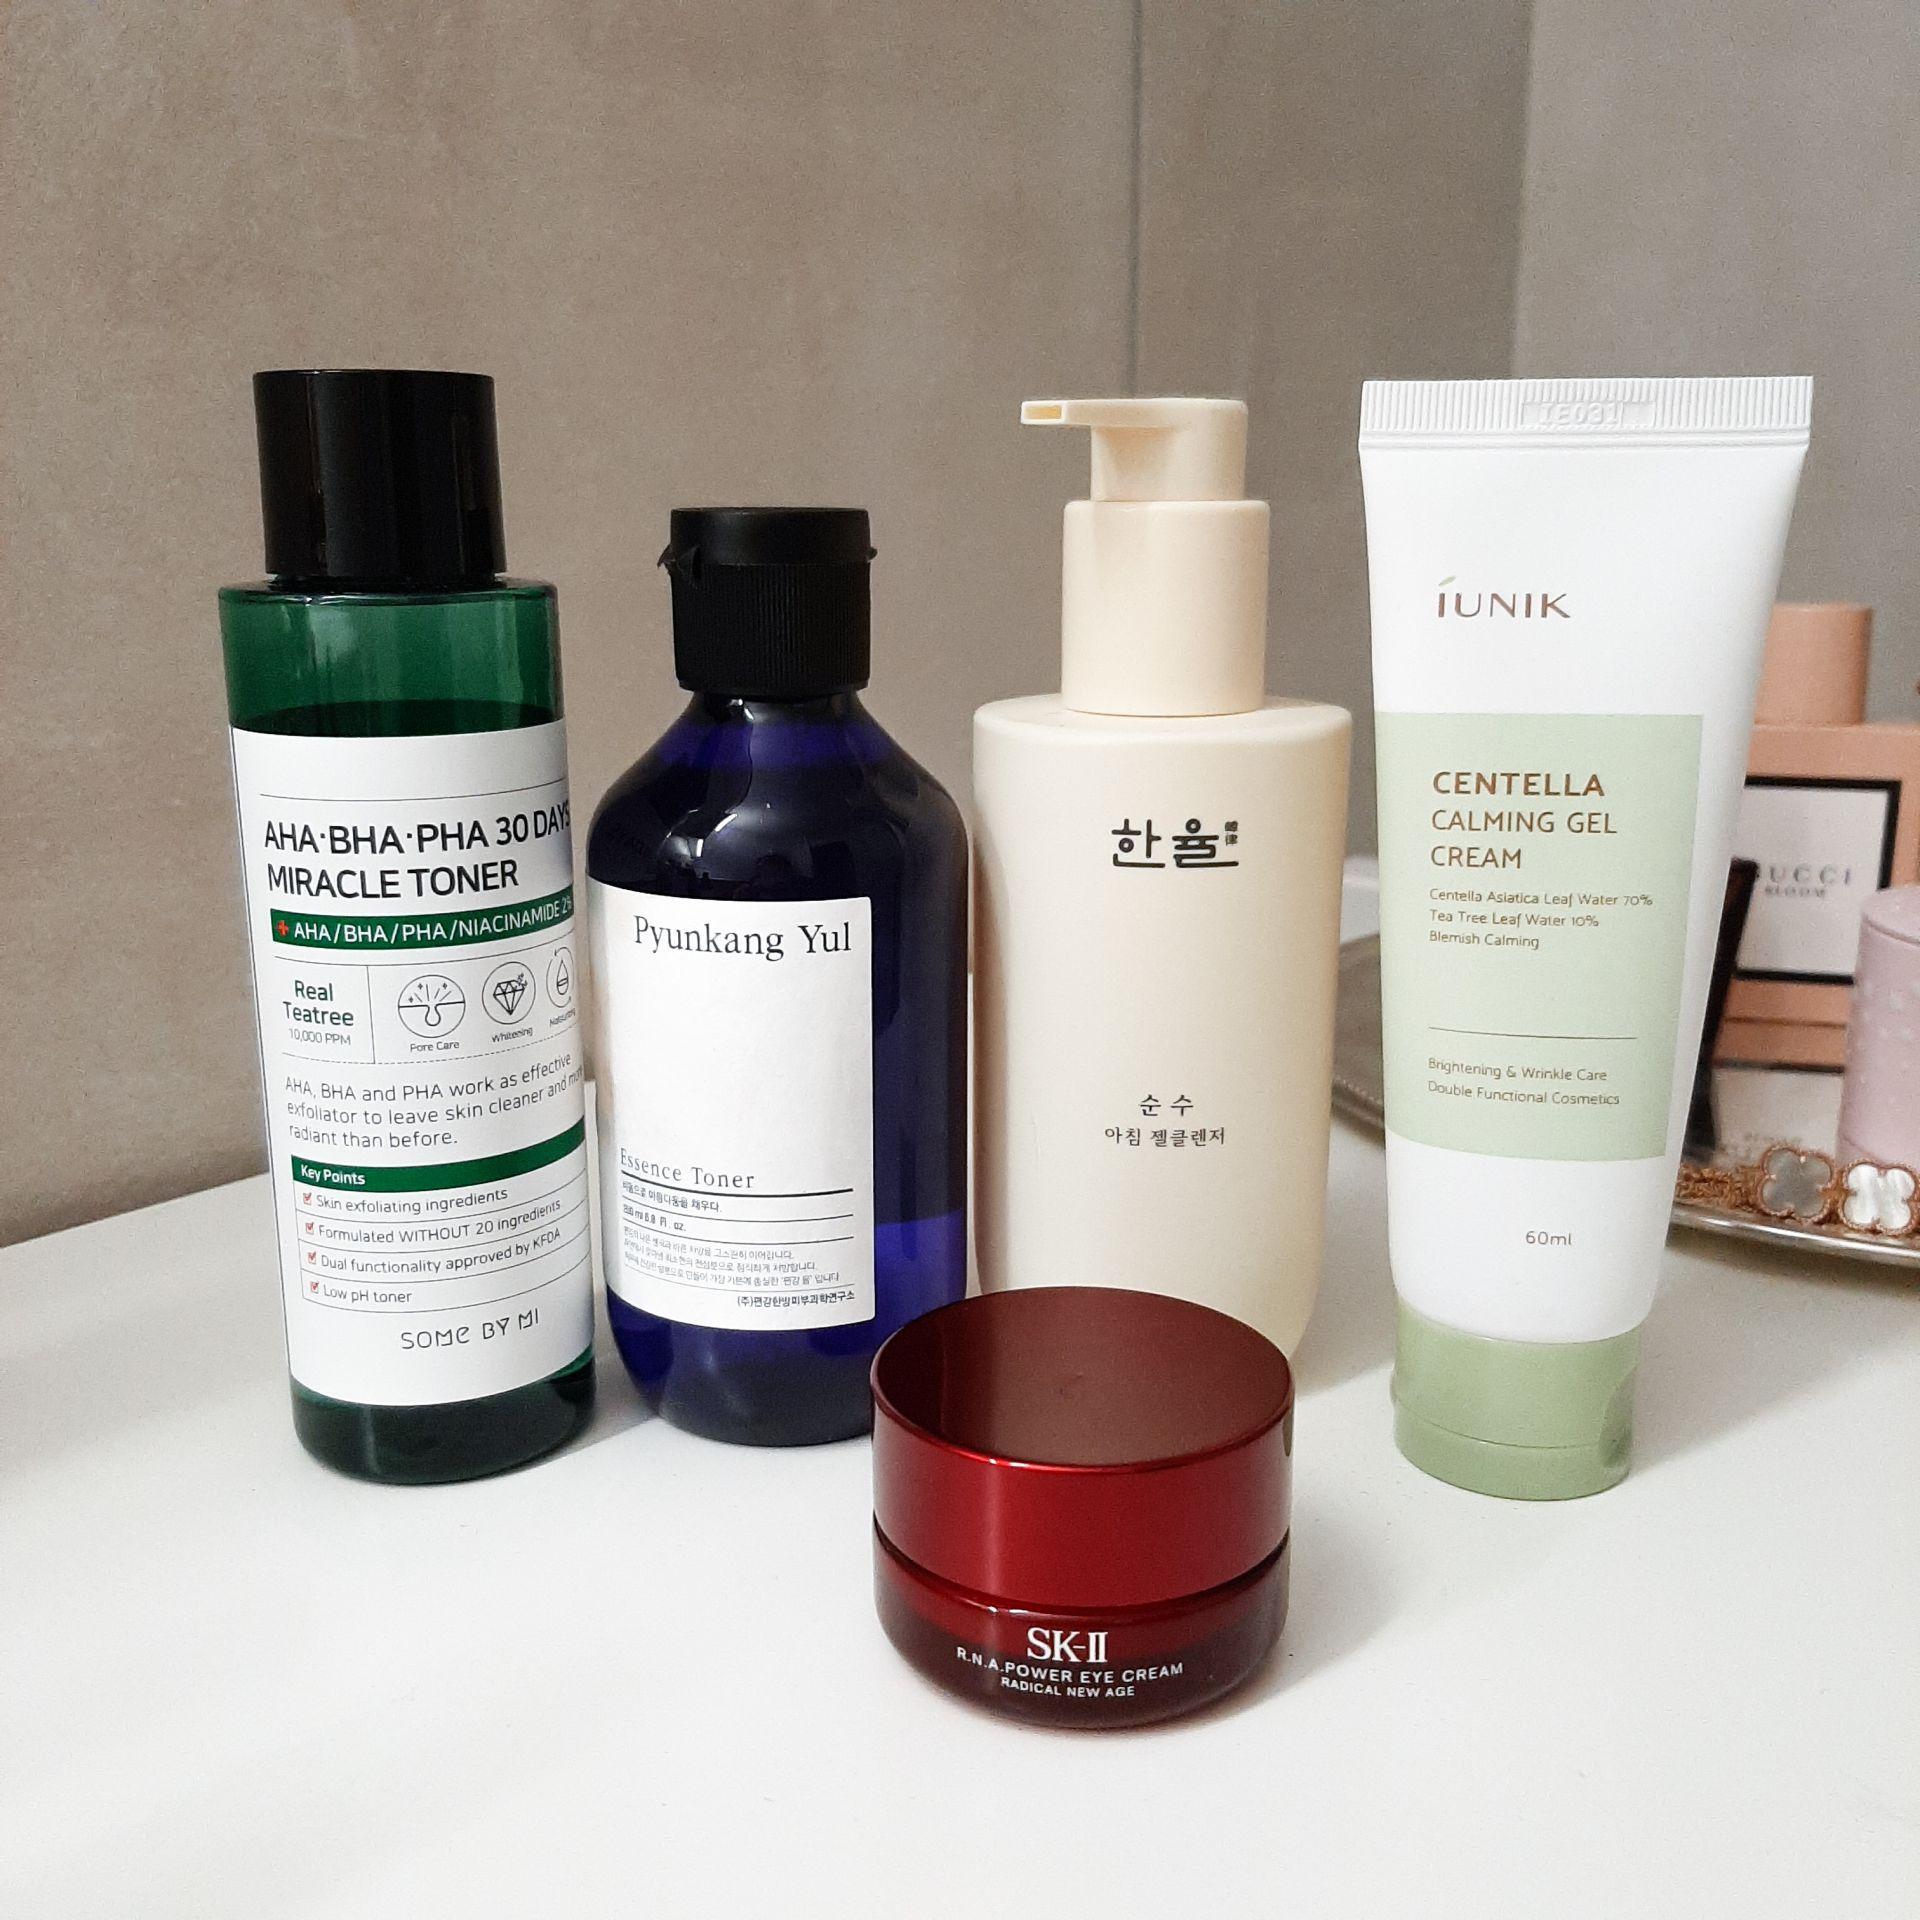 Fungal Acne Safe Korean Skincare Routine in 2020 Korean